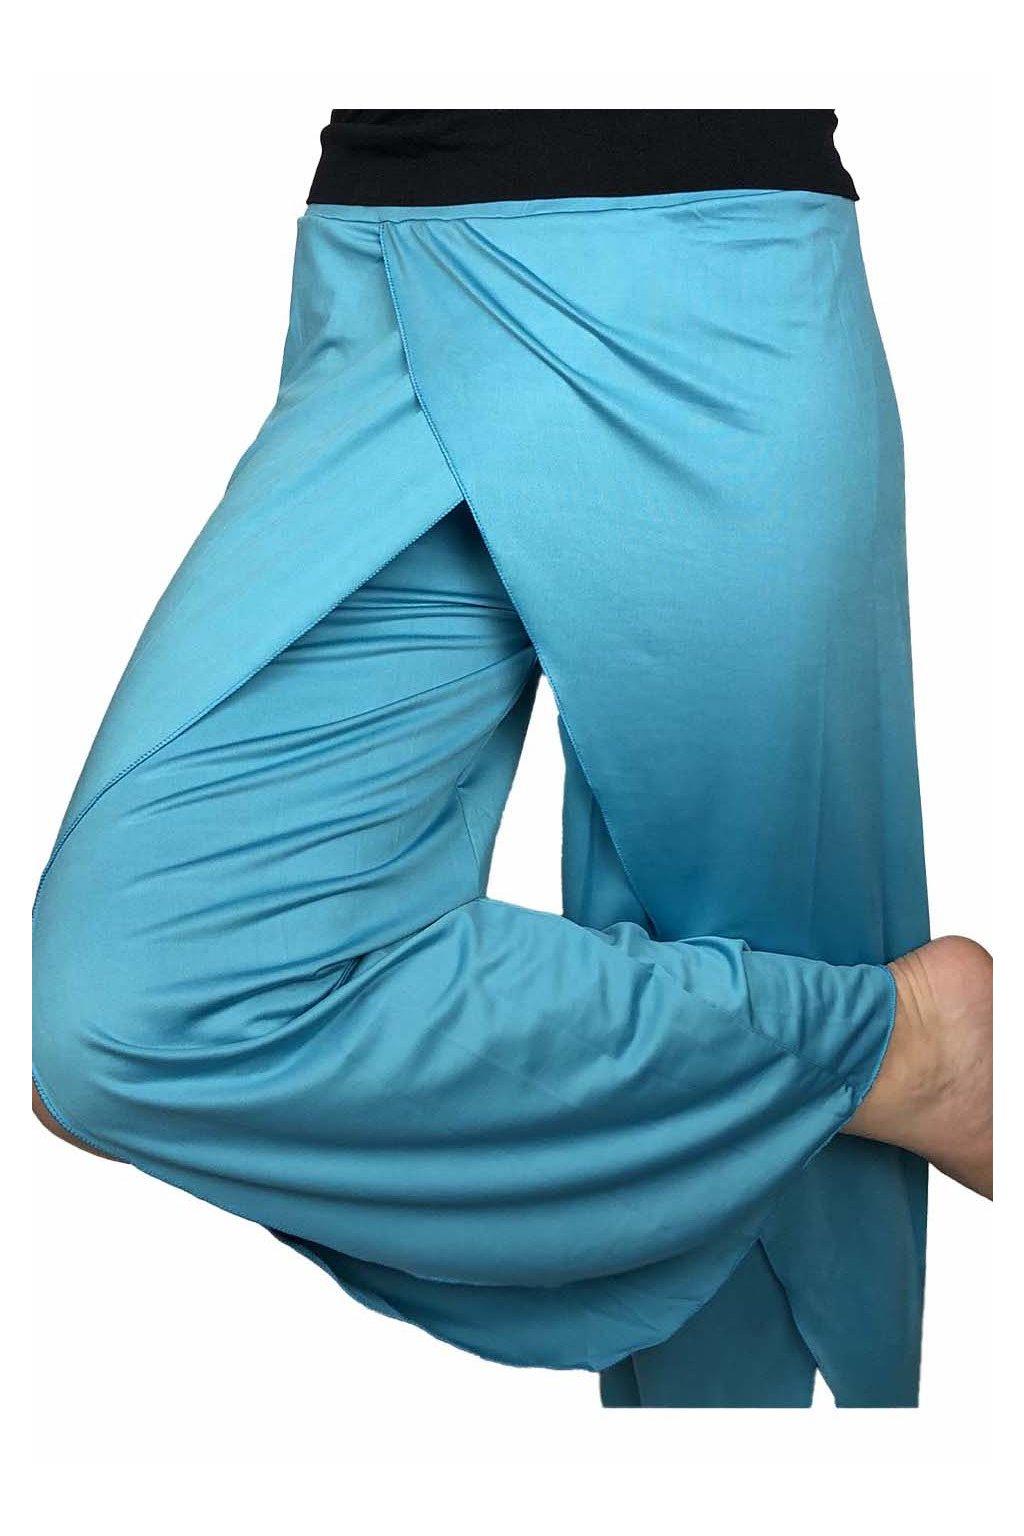 damske joga kalhoty modre 2